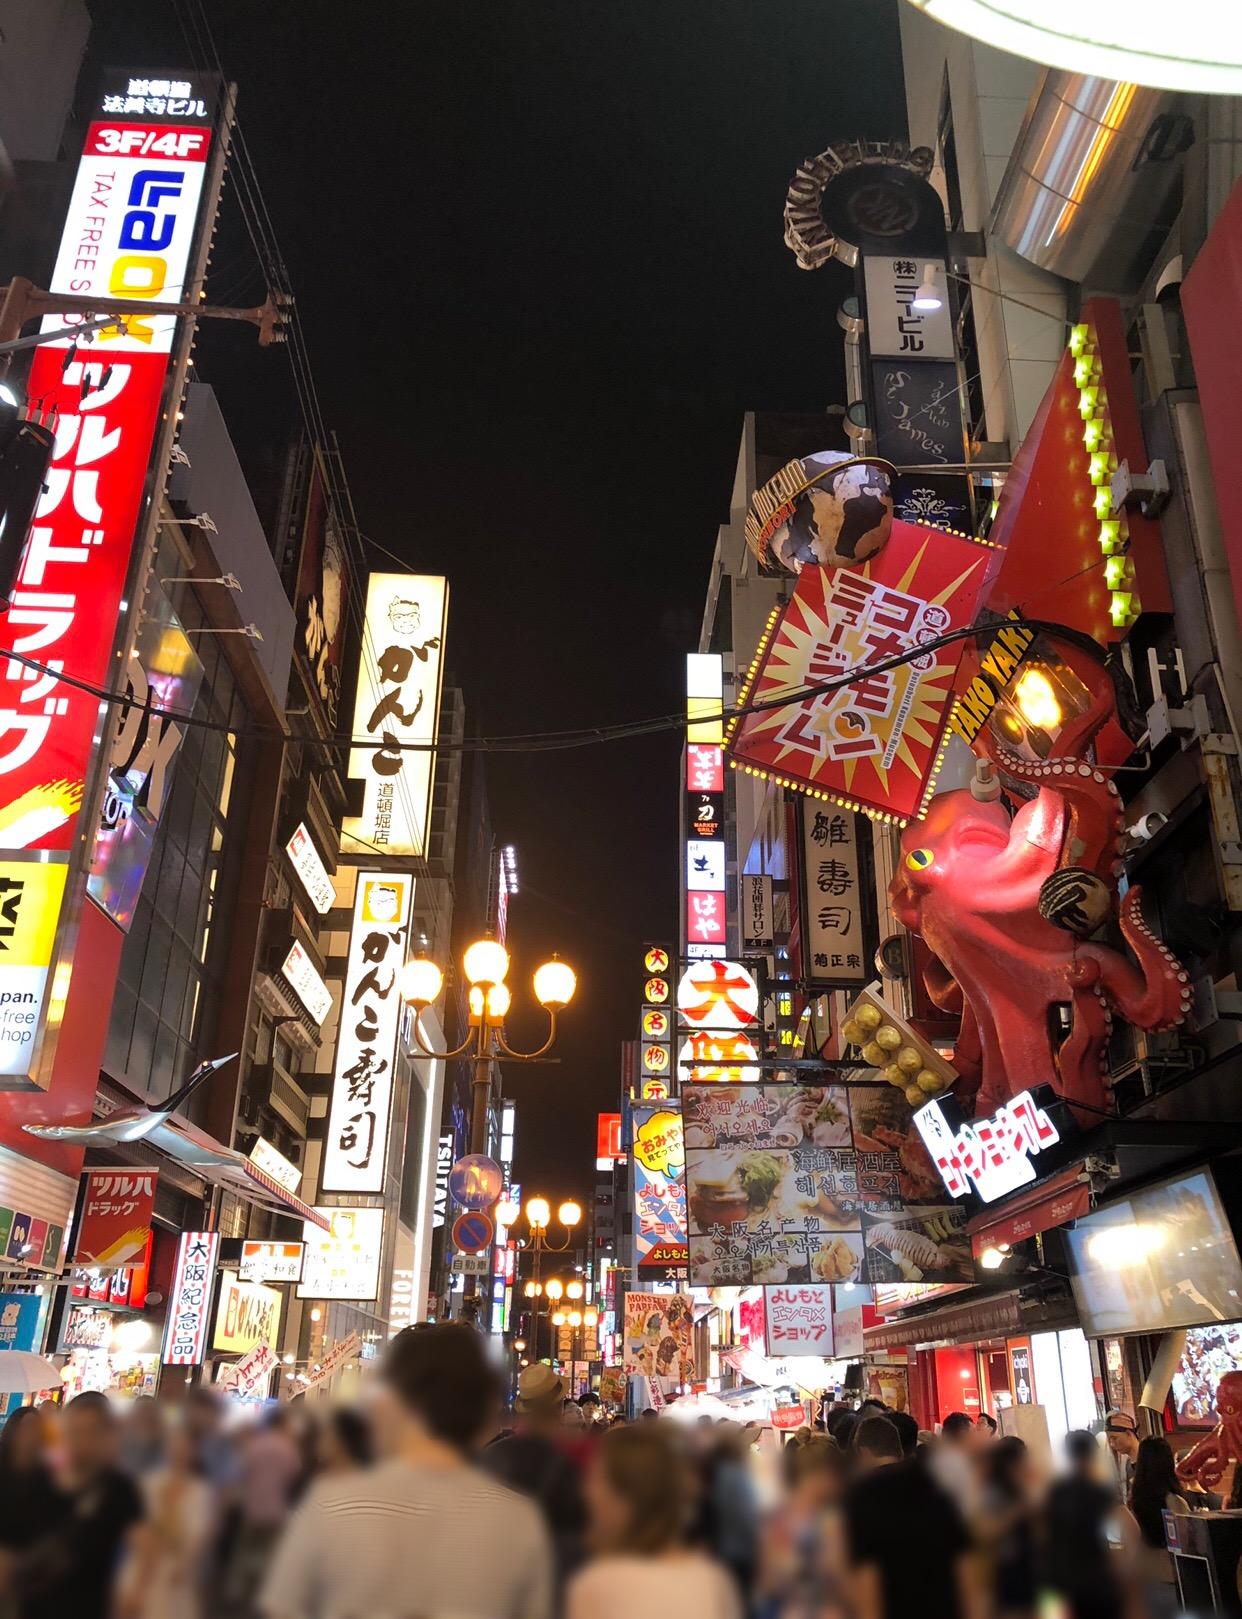 Night time Dōtonbori 夜はこんな感じ